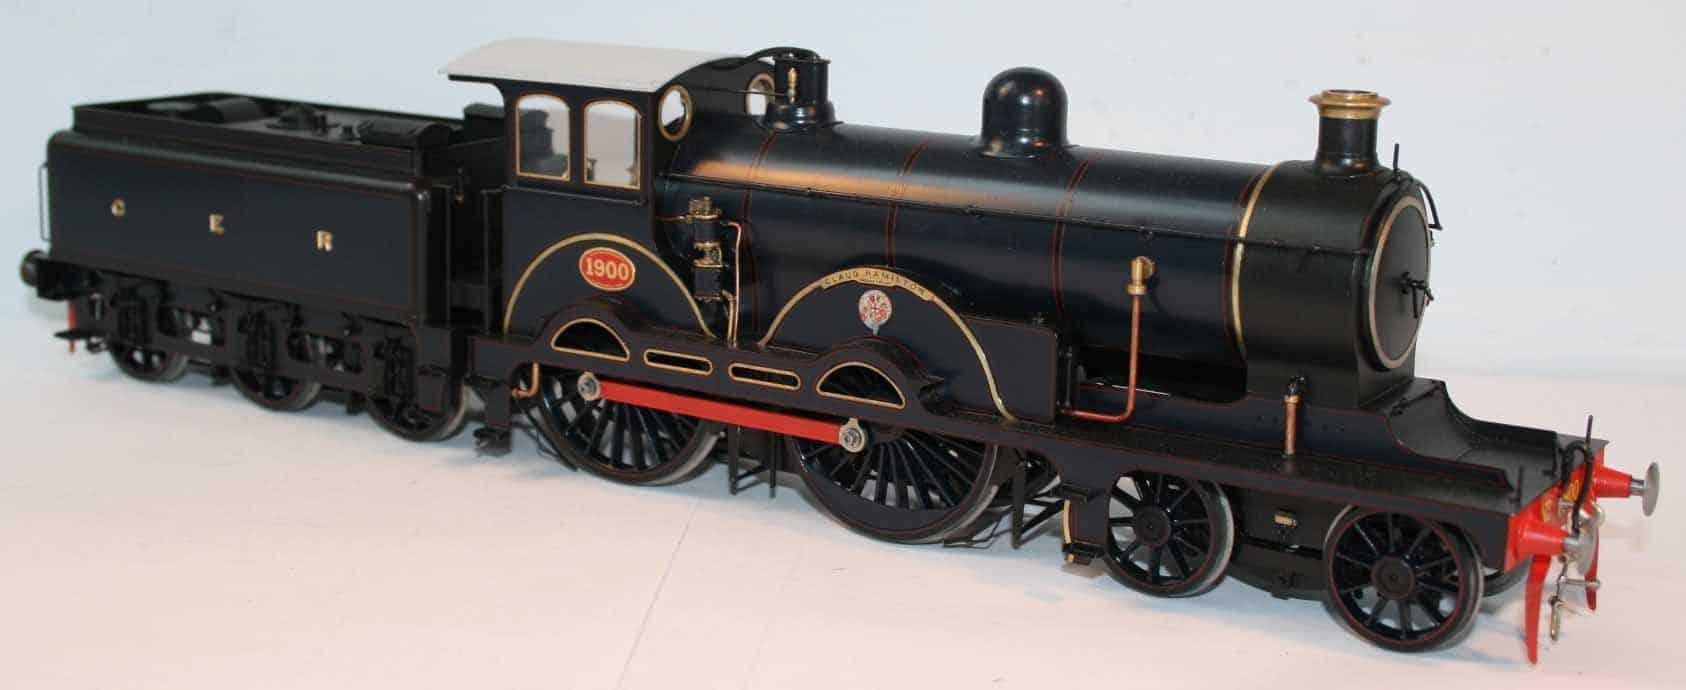 "GER Class S46 4-4-0 tender engine 1900 ""Claud Hamilton"""